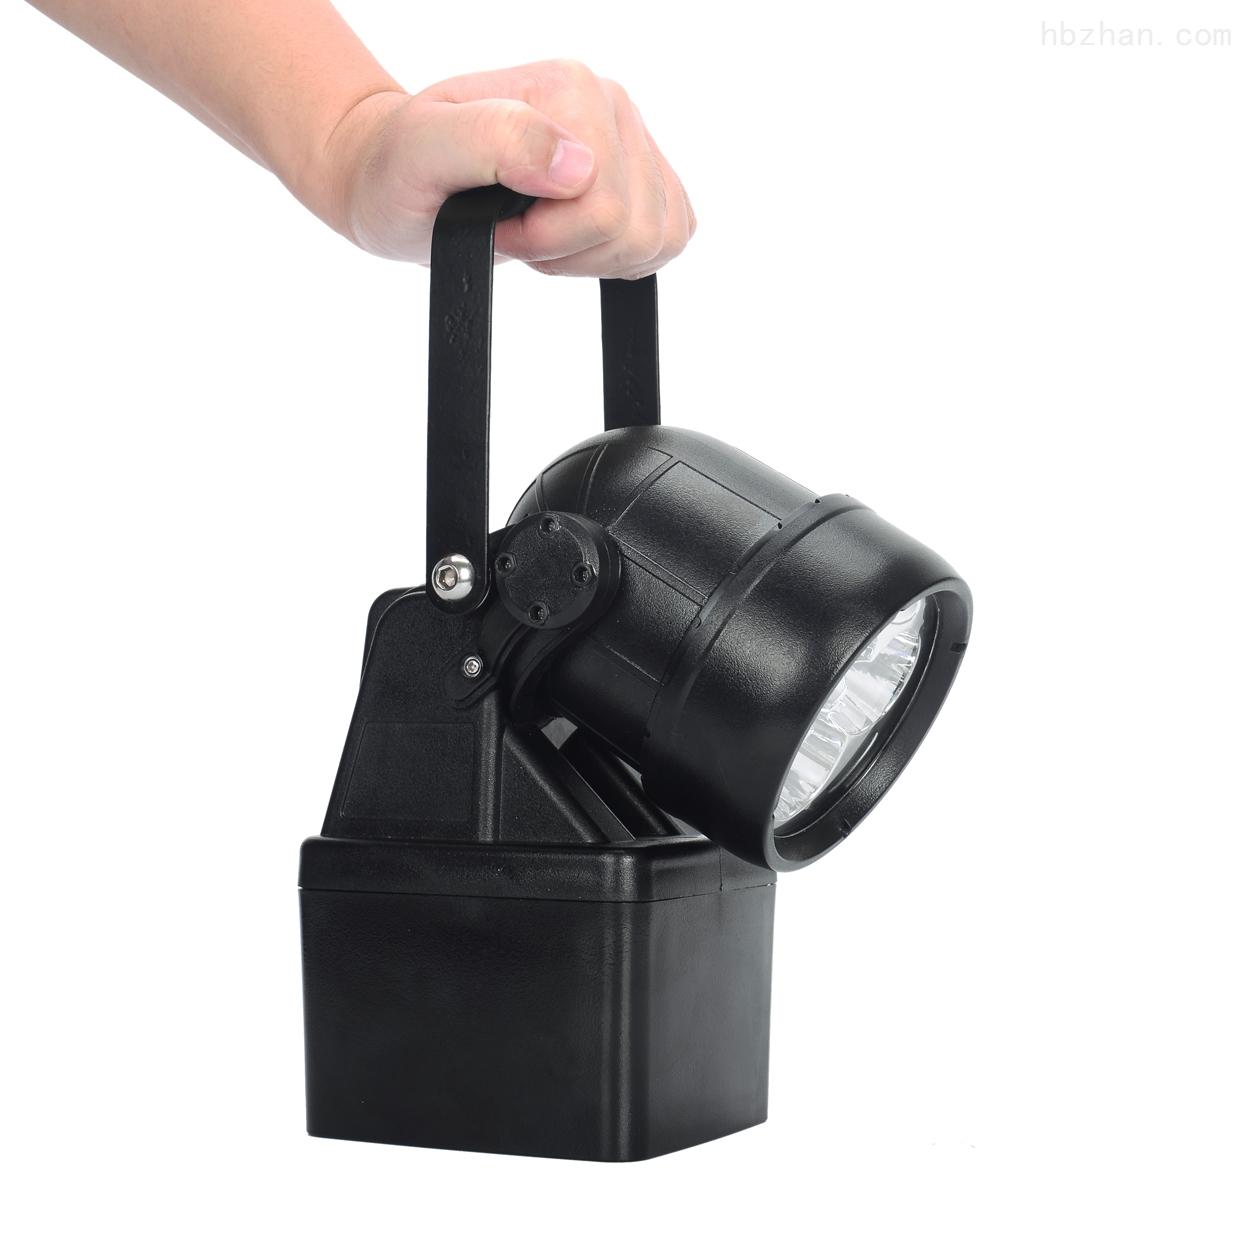 JIW5281海洋王同款LED检修灯便携磁力探照灯